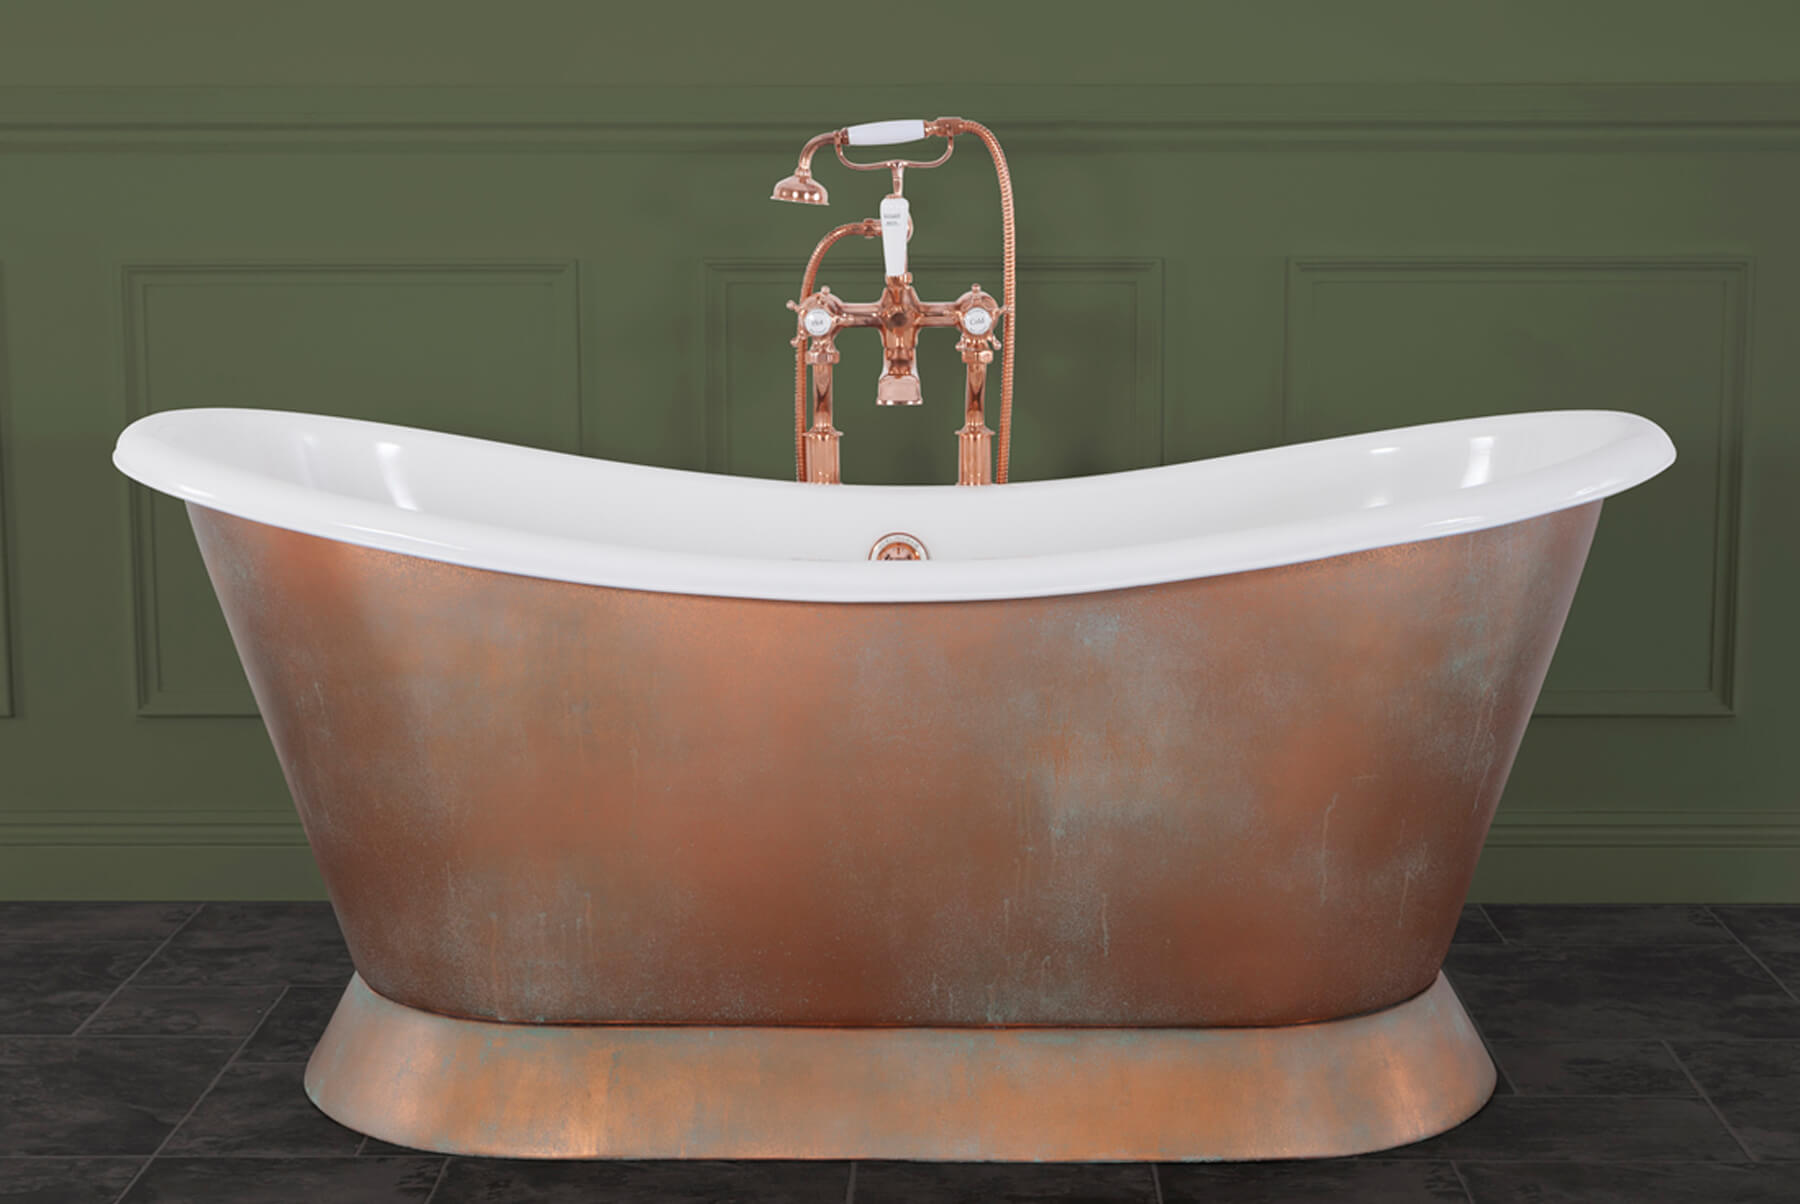 Bath-Tubs-Hurlinghma-copper-bateau-bath-white-enamel-interior-verdigris-exterior-1800x1204